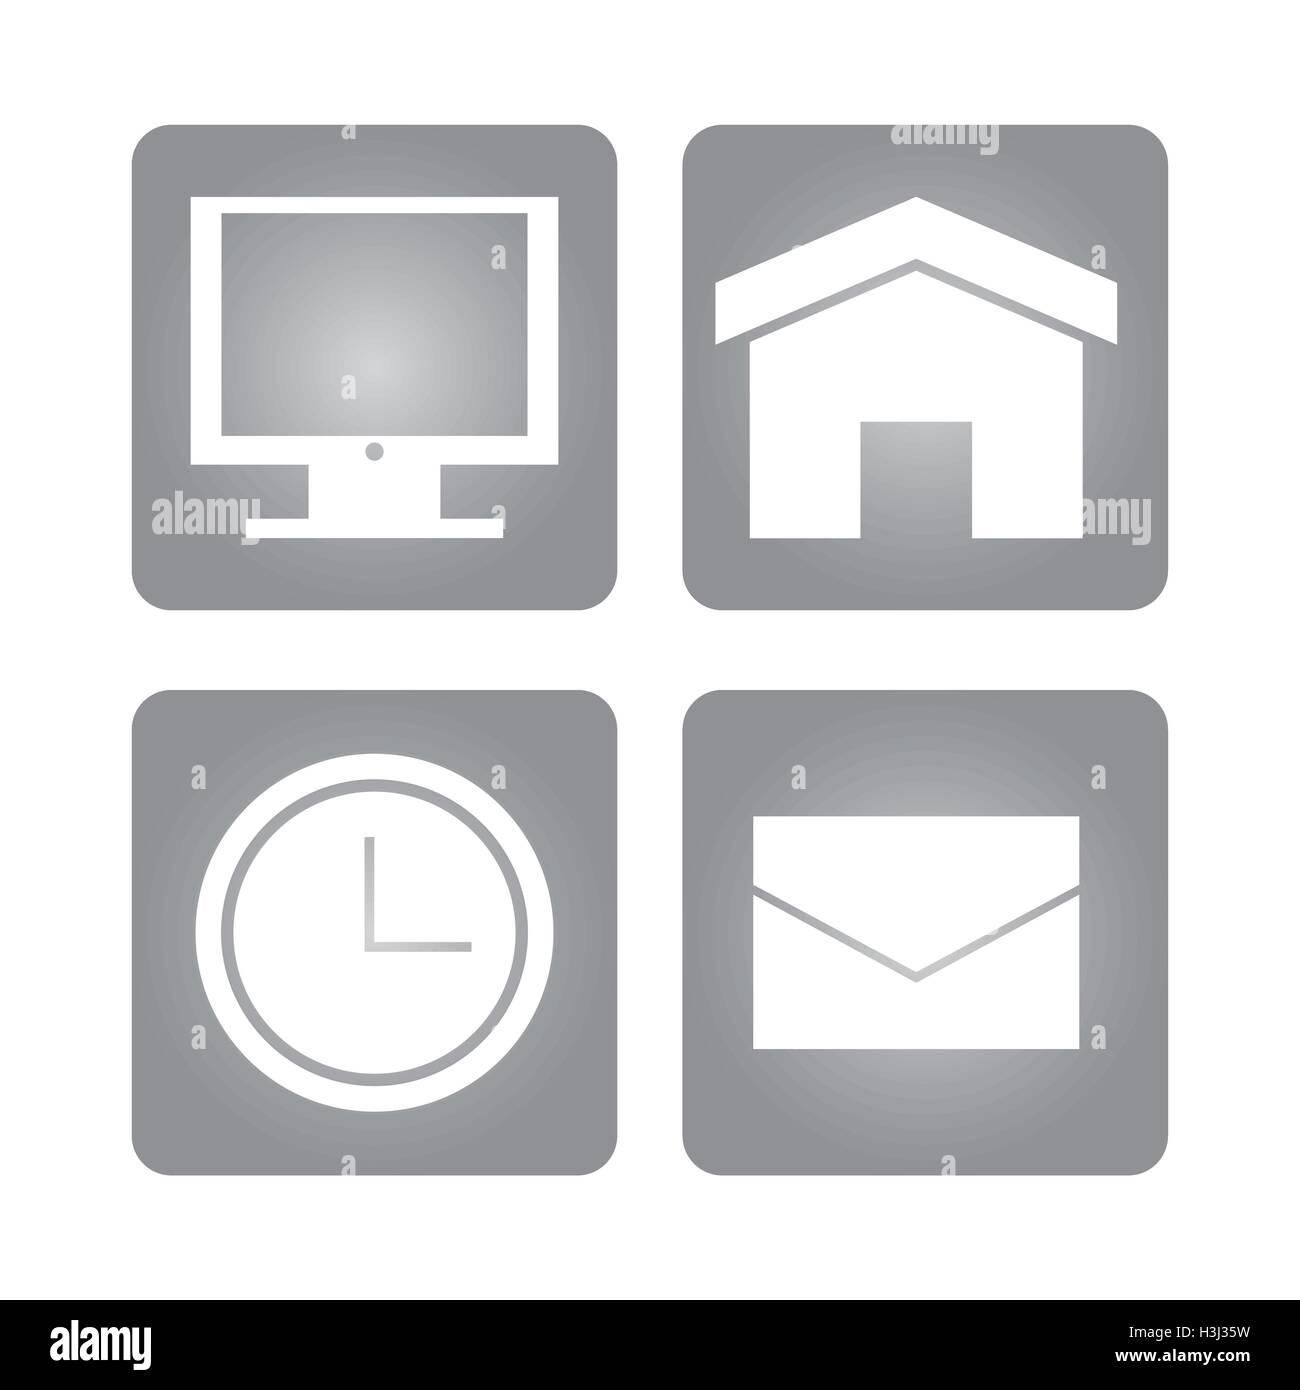 Apps Inside Frames And Social Media Design Stock Vector Image Art Alamy